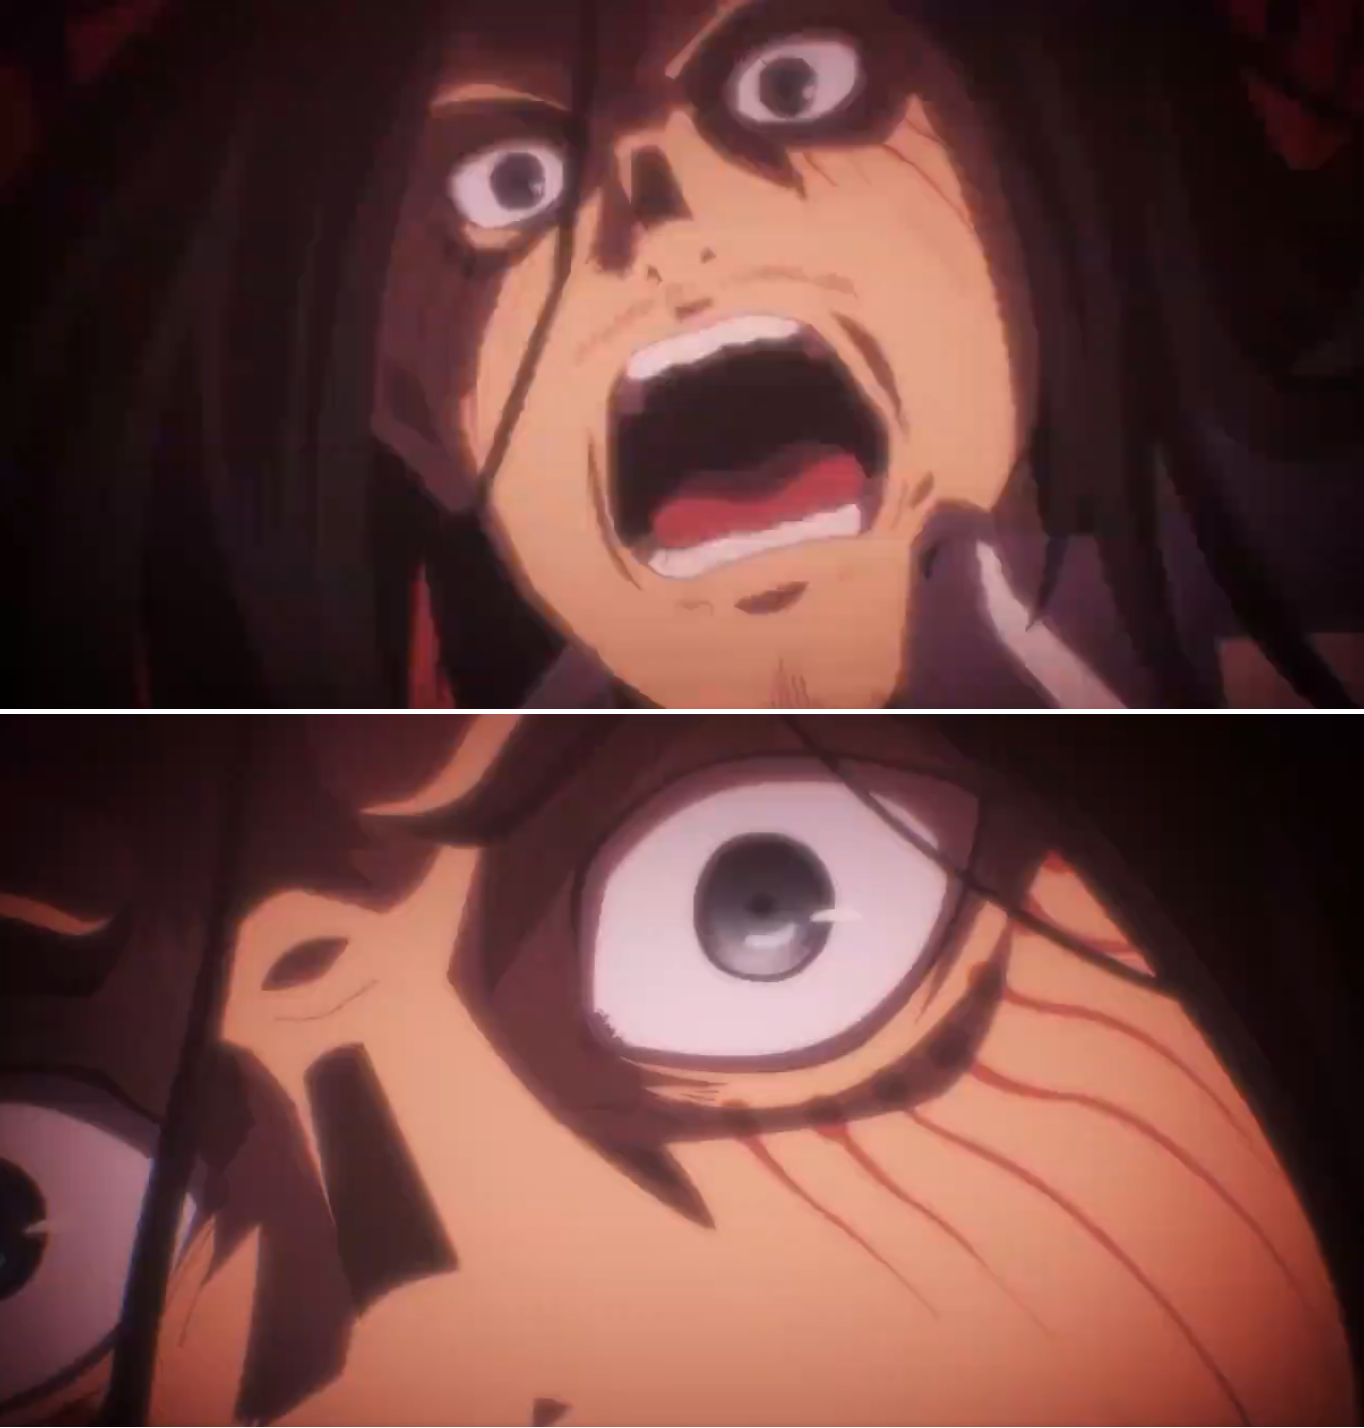 AoT s4 trailer in 2020 Attack on titan anime, Attack on